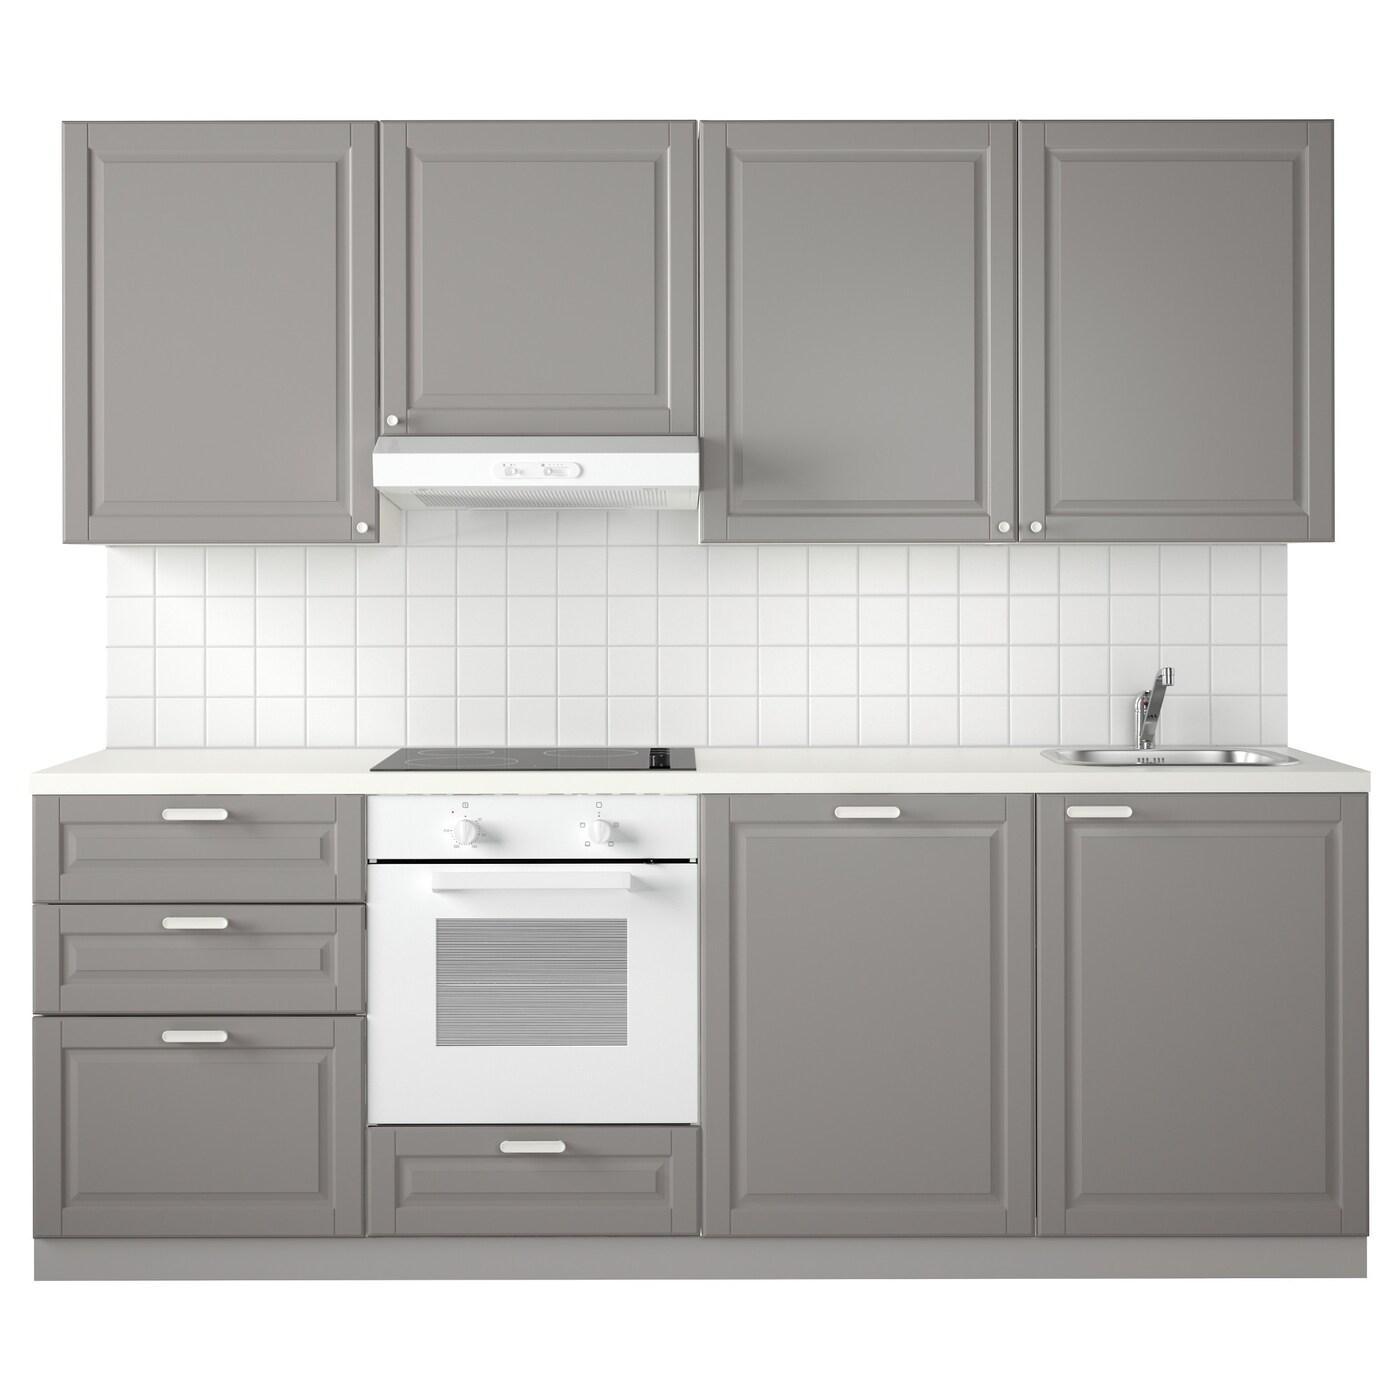 Ikea Bodbyn Küche Weiß